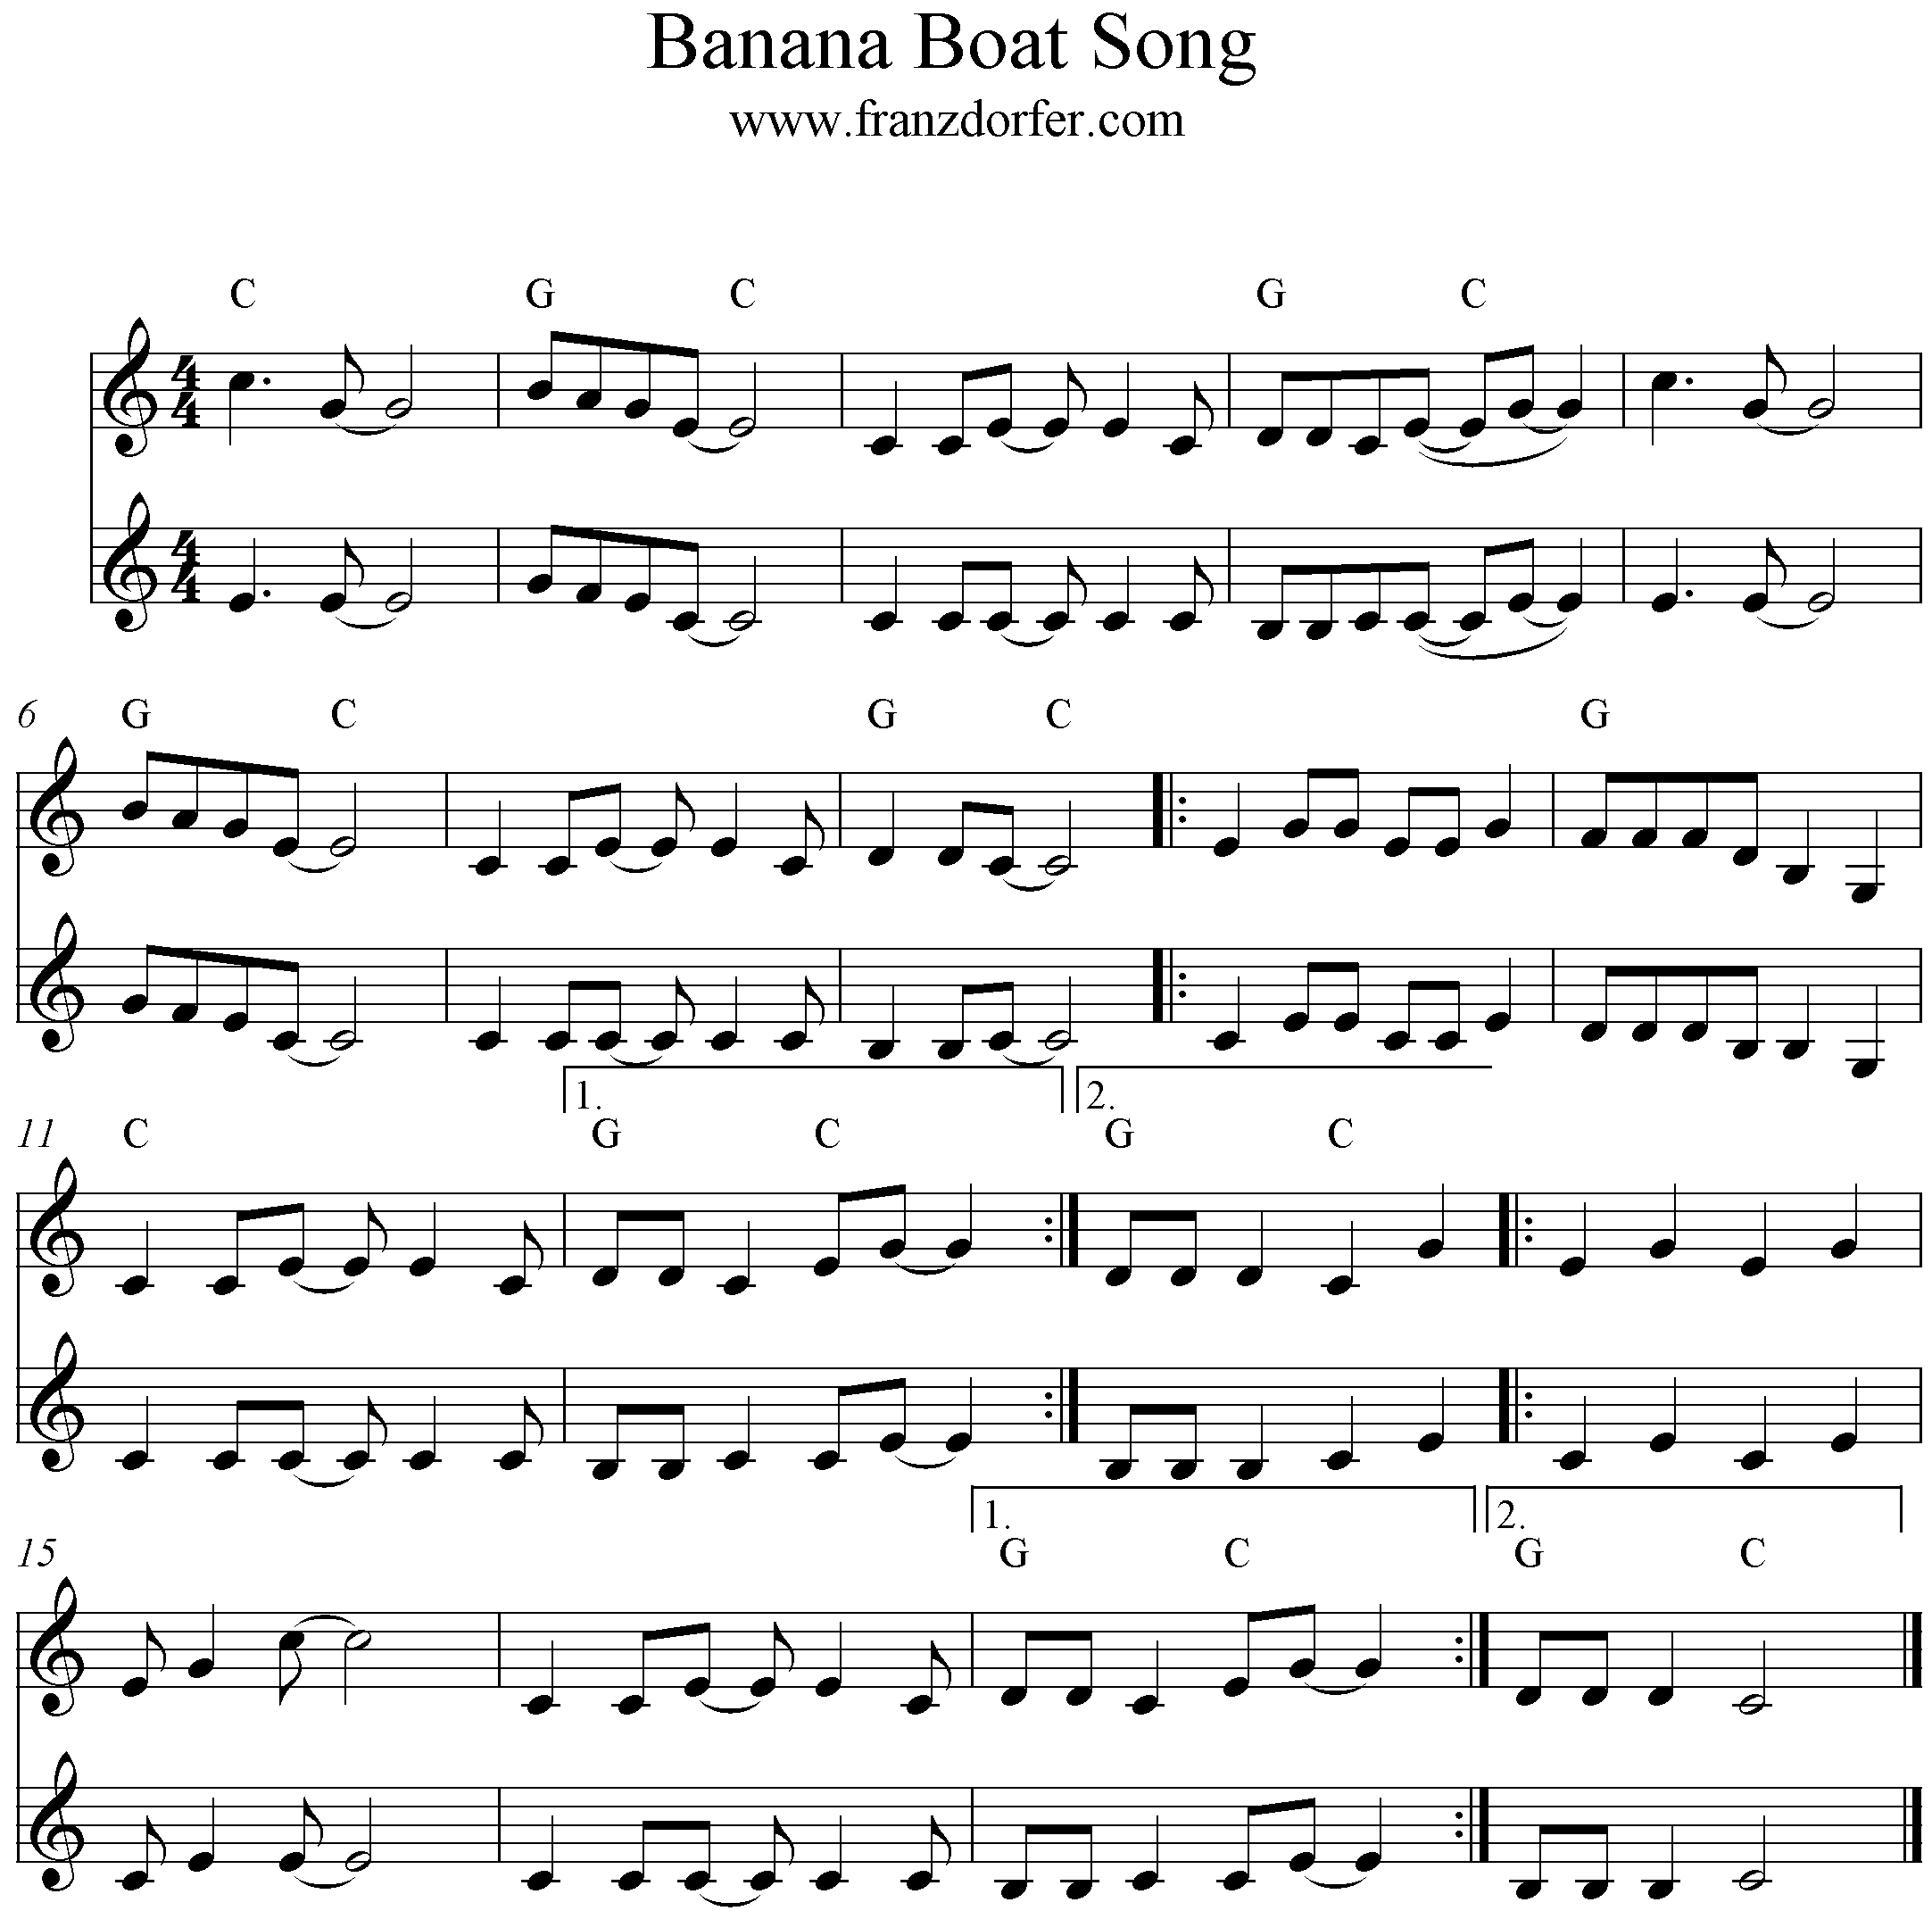 Banana Boat Song, Klarinette, 2 stimmig, Clarinet, Duo, C-Major